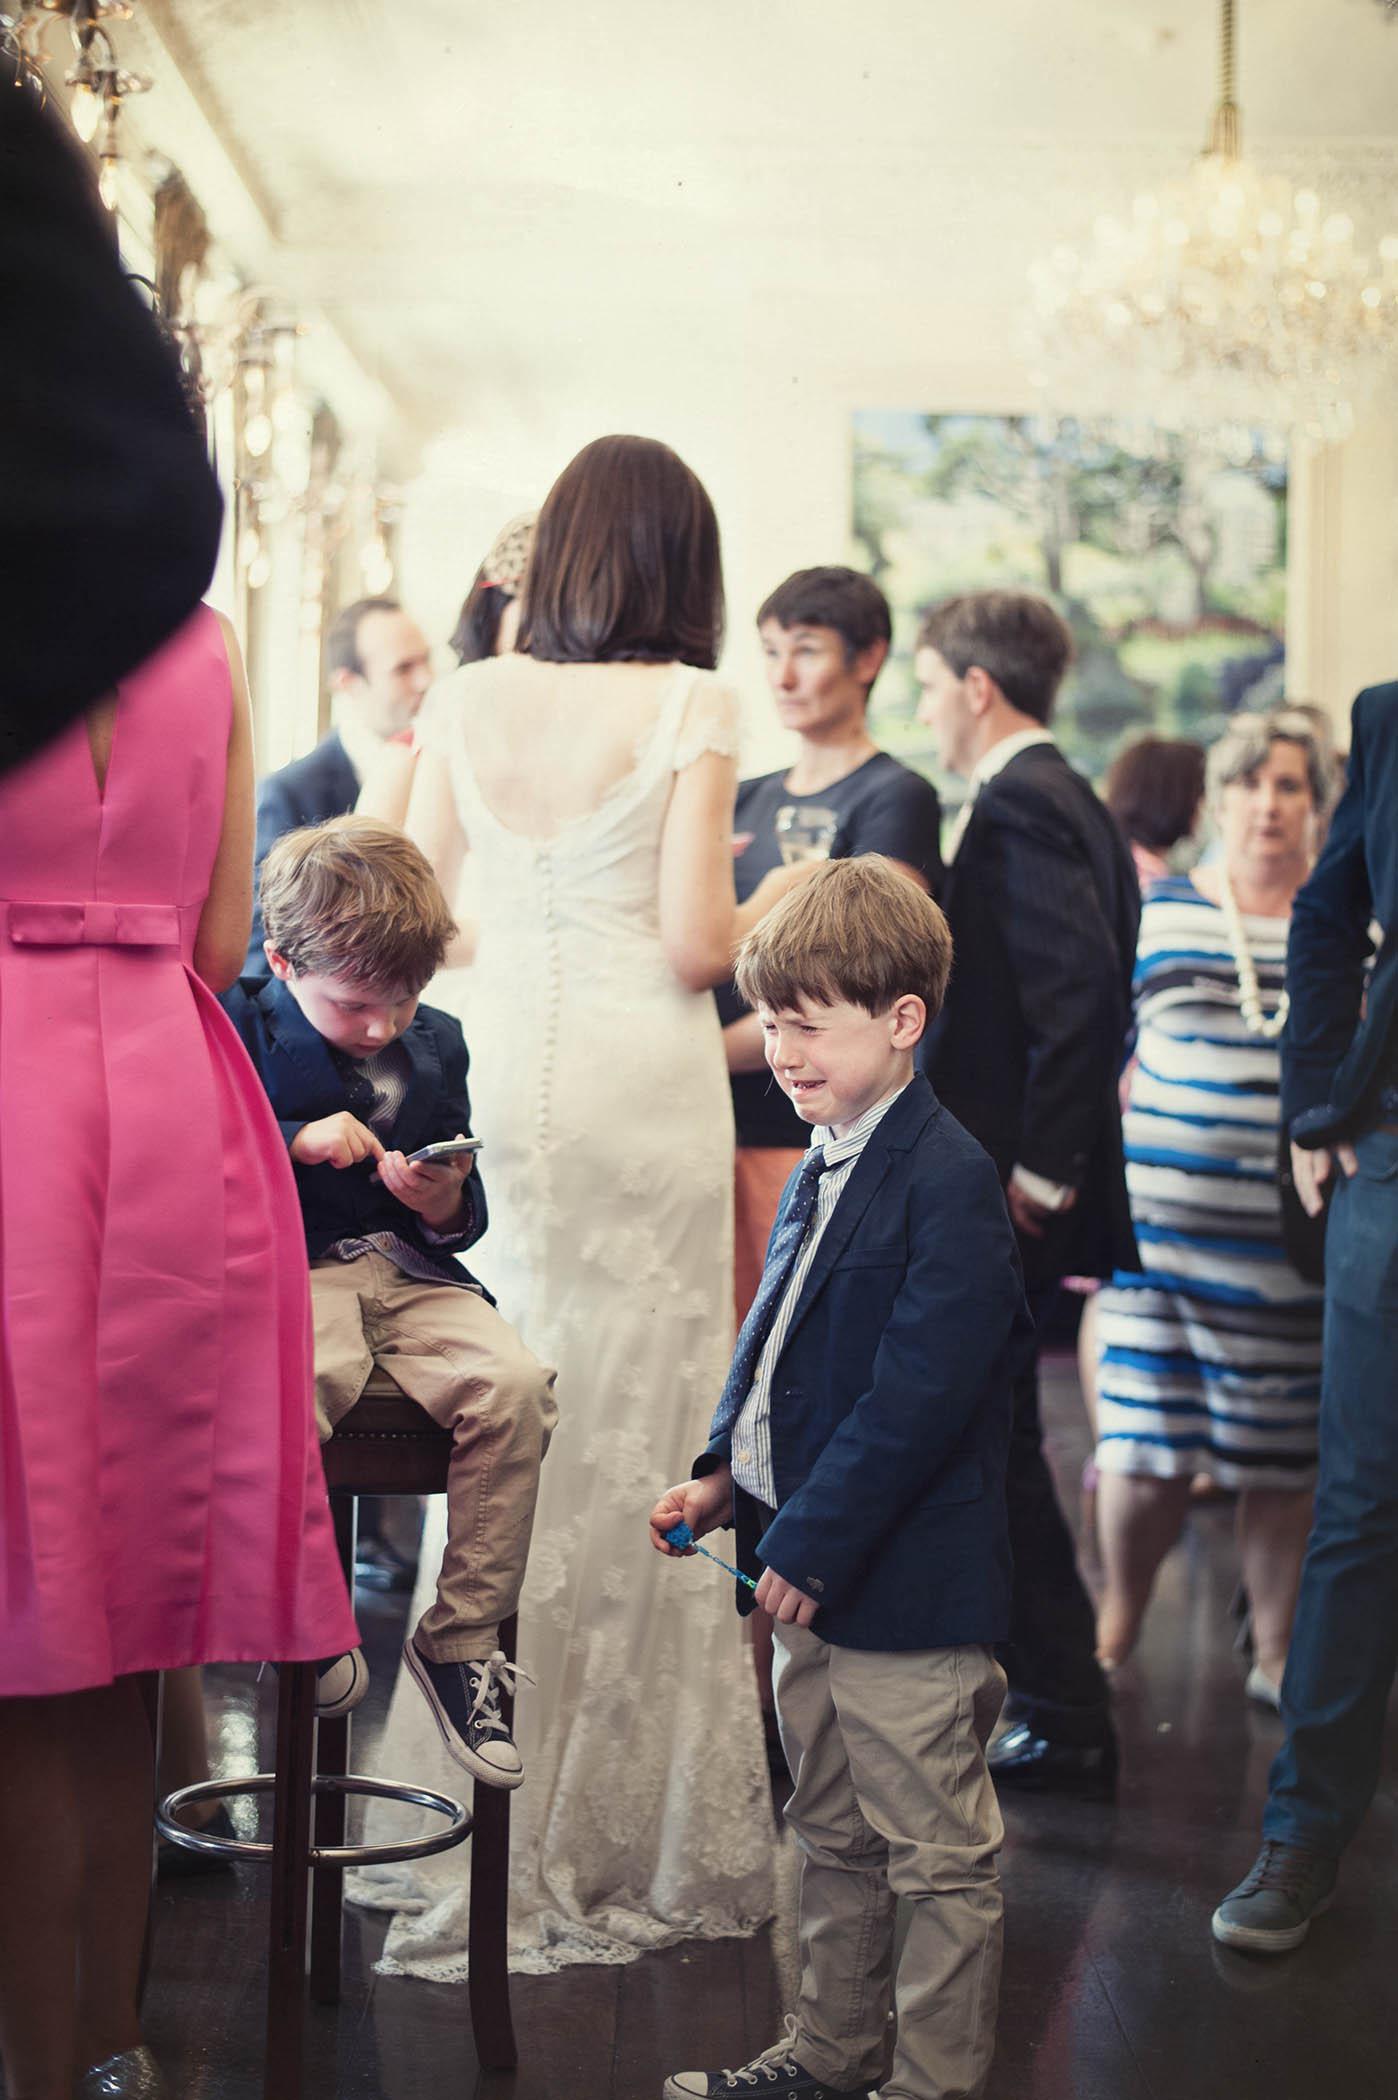 Fallon and Byrne wedding, children at wedding